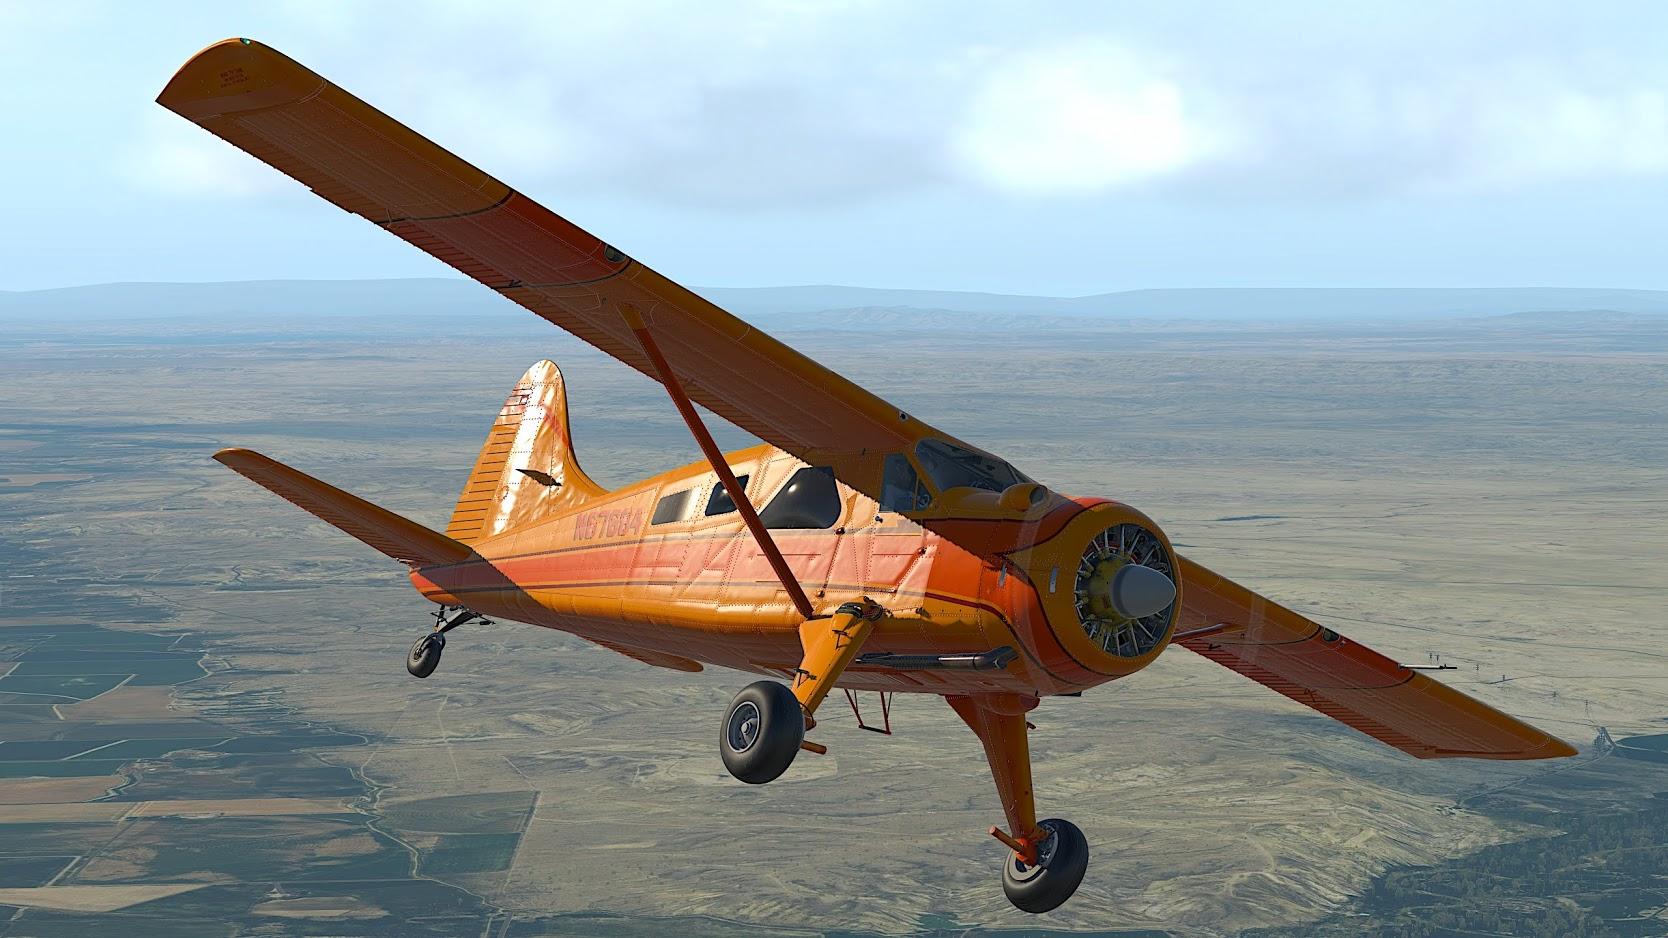 DHC2_Beaver - 2020-11-19 15.05.41